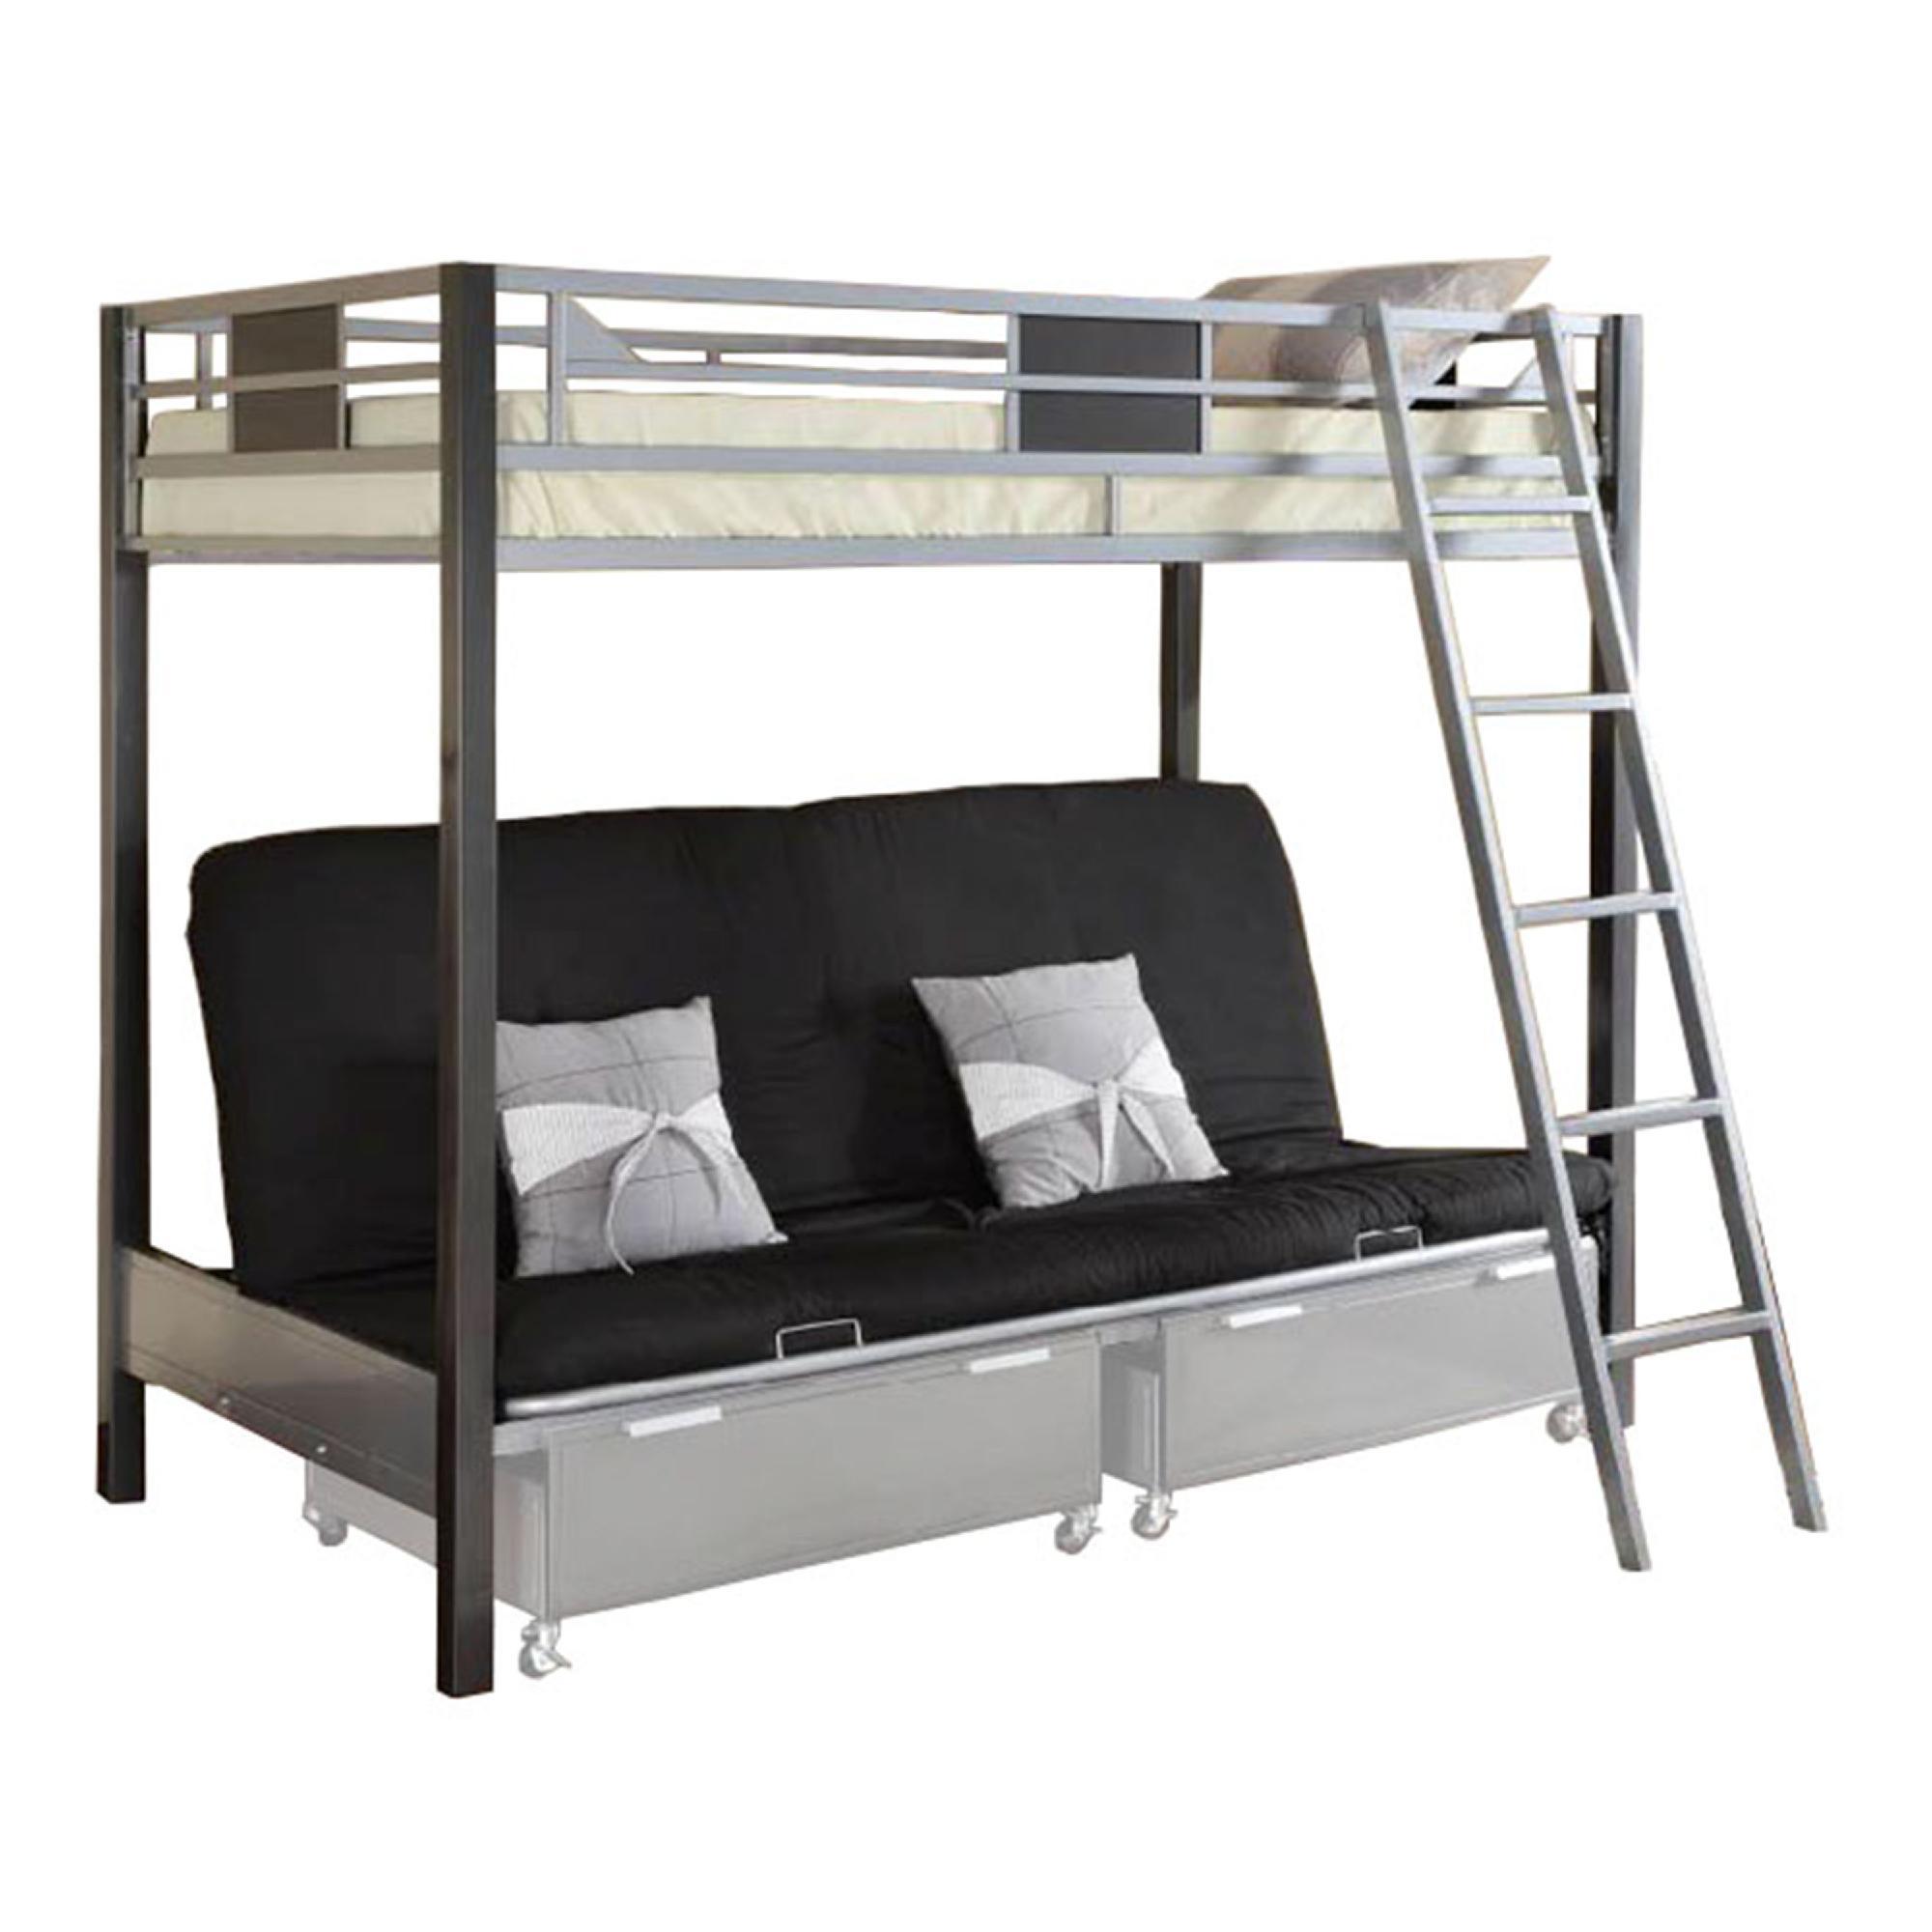 metal sofa bed parts baxton studio sectional grey venetian worldwide cletis iii twin over futon bunk